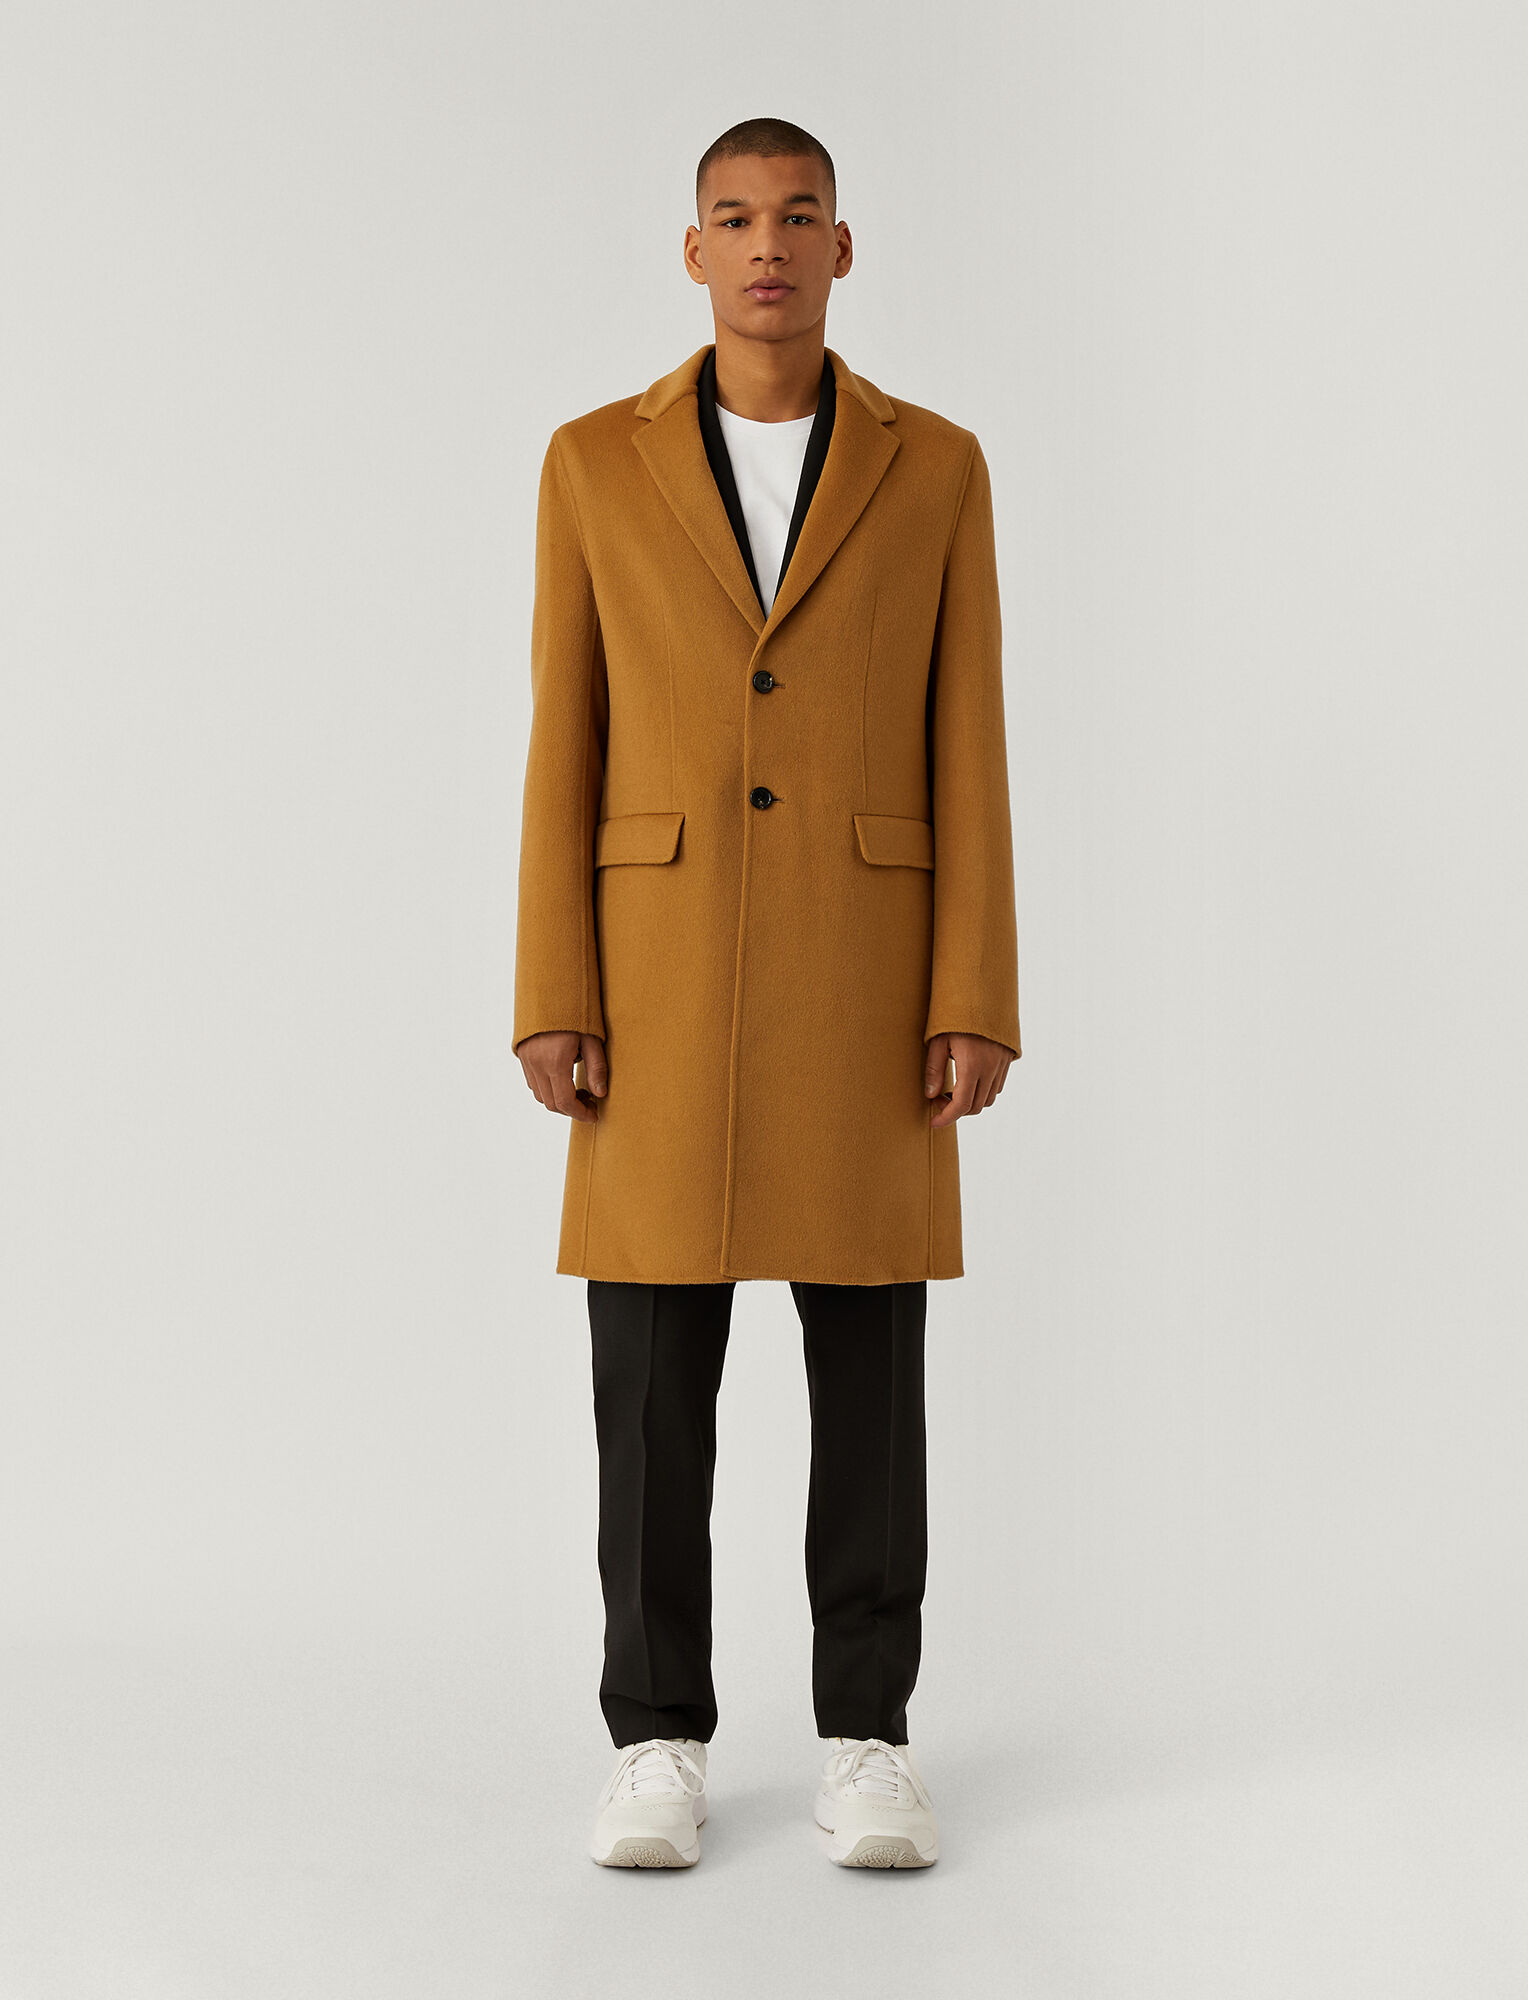 Joseph, Double Face Cashmere Coat, in CAMEL